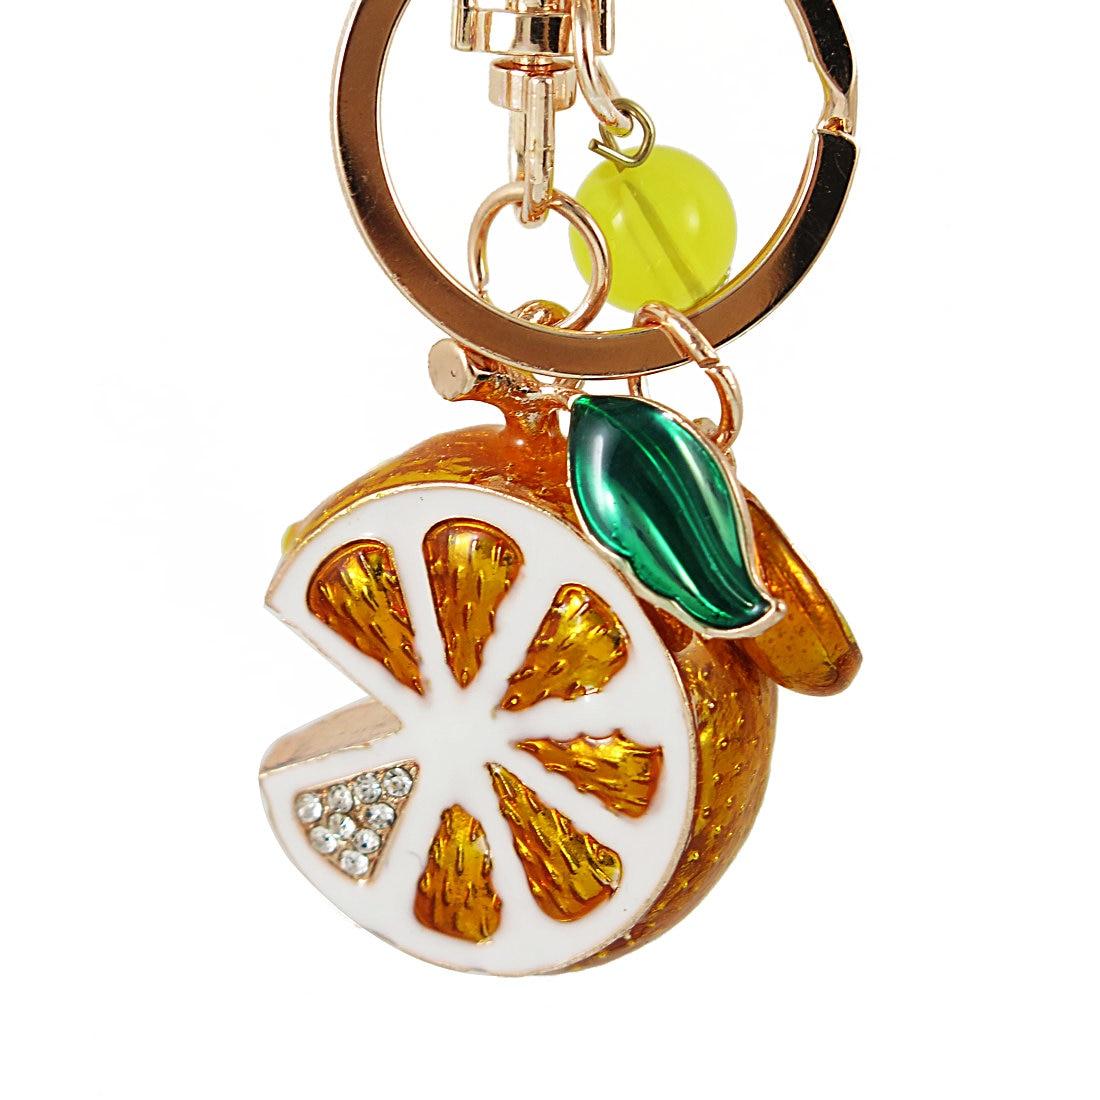 Job Lot x3 Christmas Betty Boop Key Rings Bag Charms Wholesale UK Seller